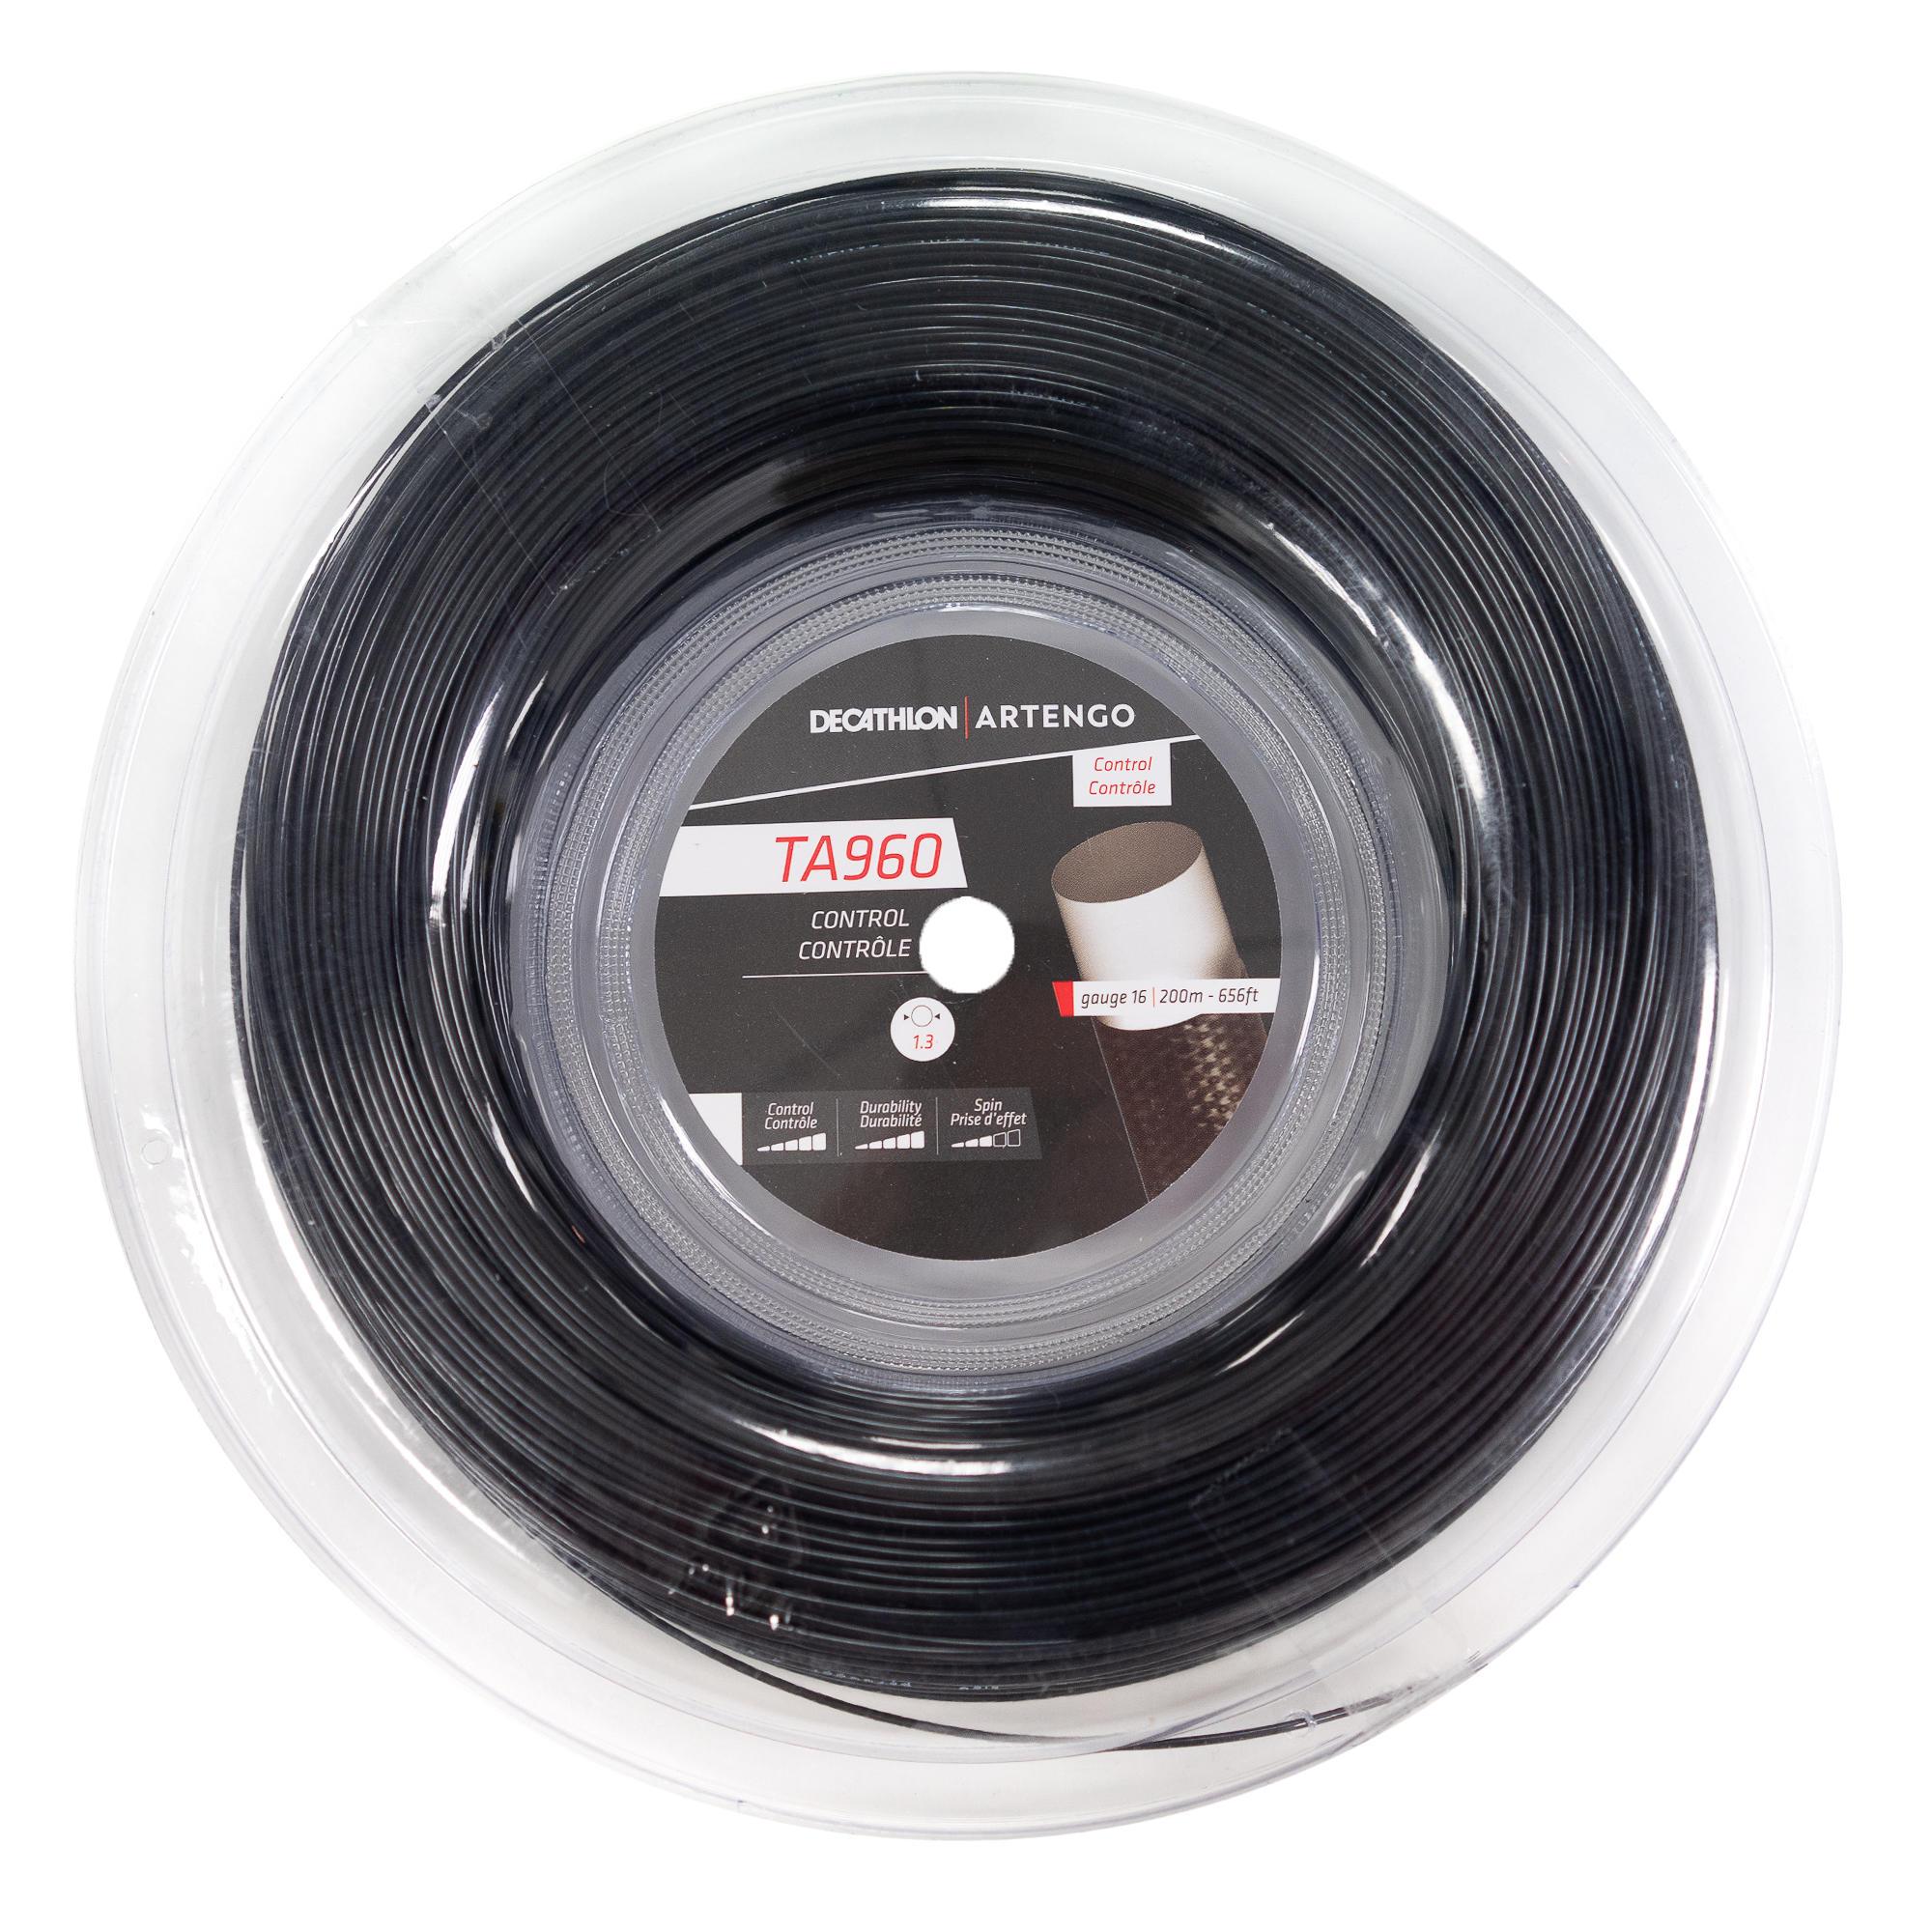 Artengo BOBINE DE CORDAGE DE TENNIS MONOFILAMENT TA 960 Control 1.3 mm NOIR. - Artengo